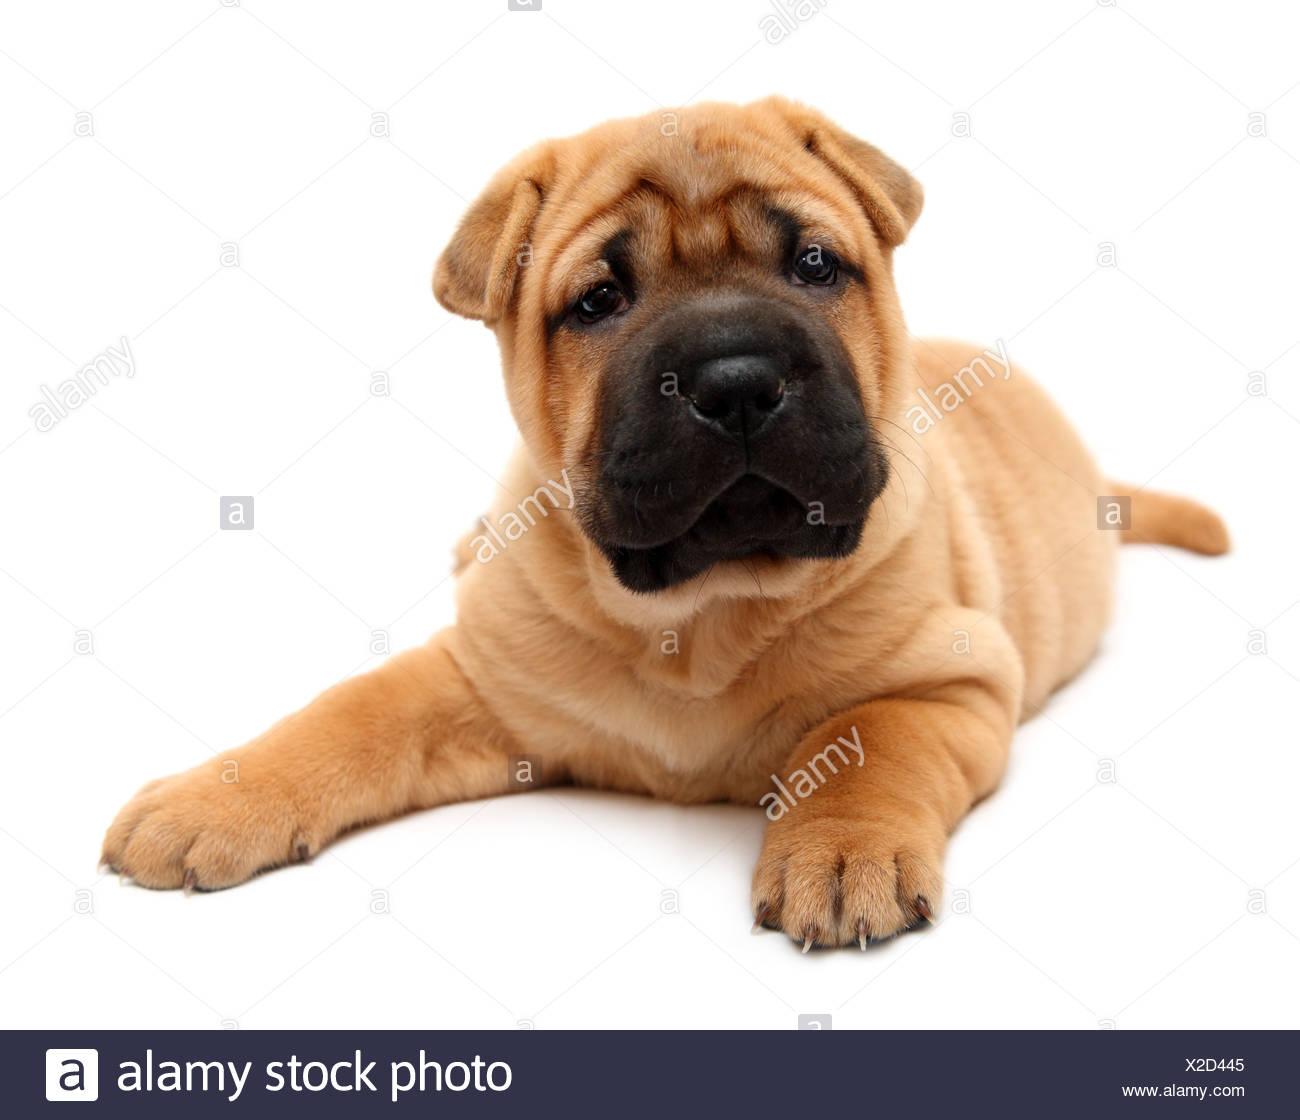 shar pei puppy - Stock Image